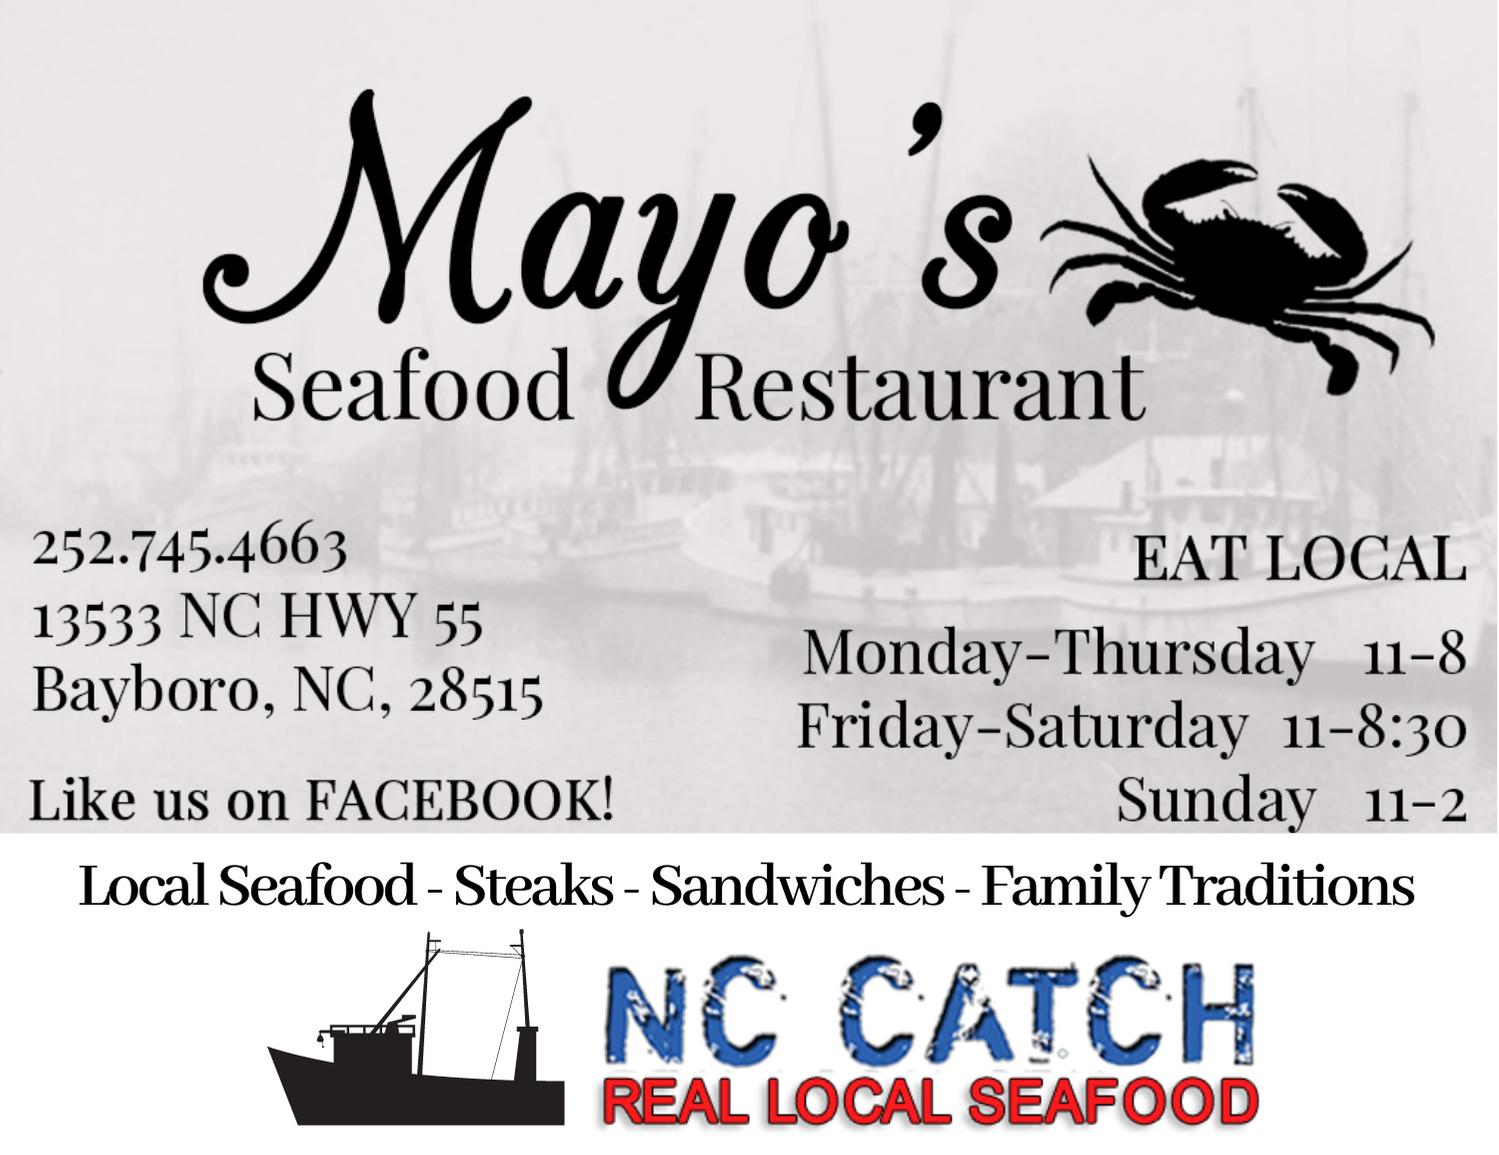 Mayo's Seafood Restaurant